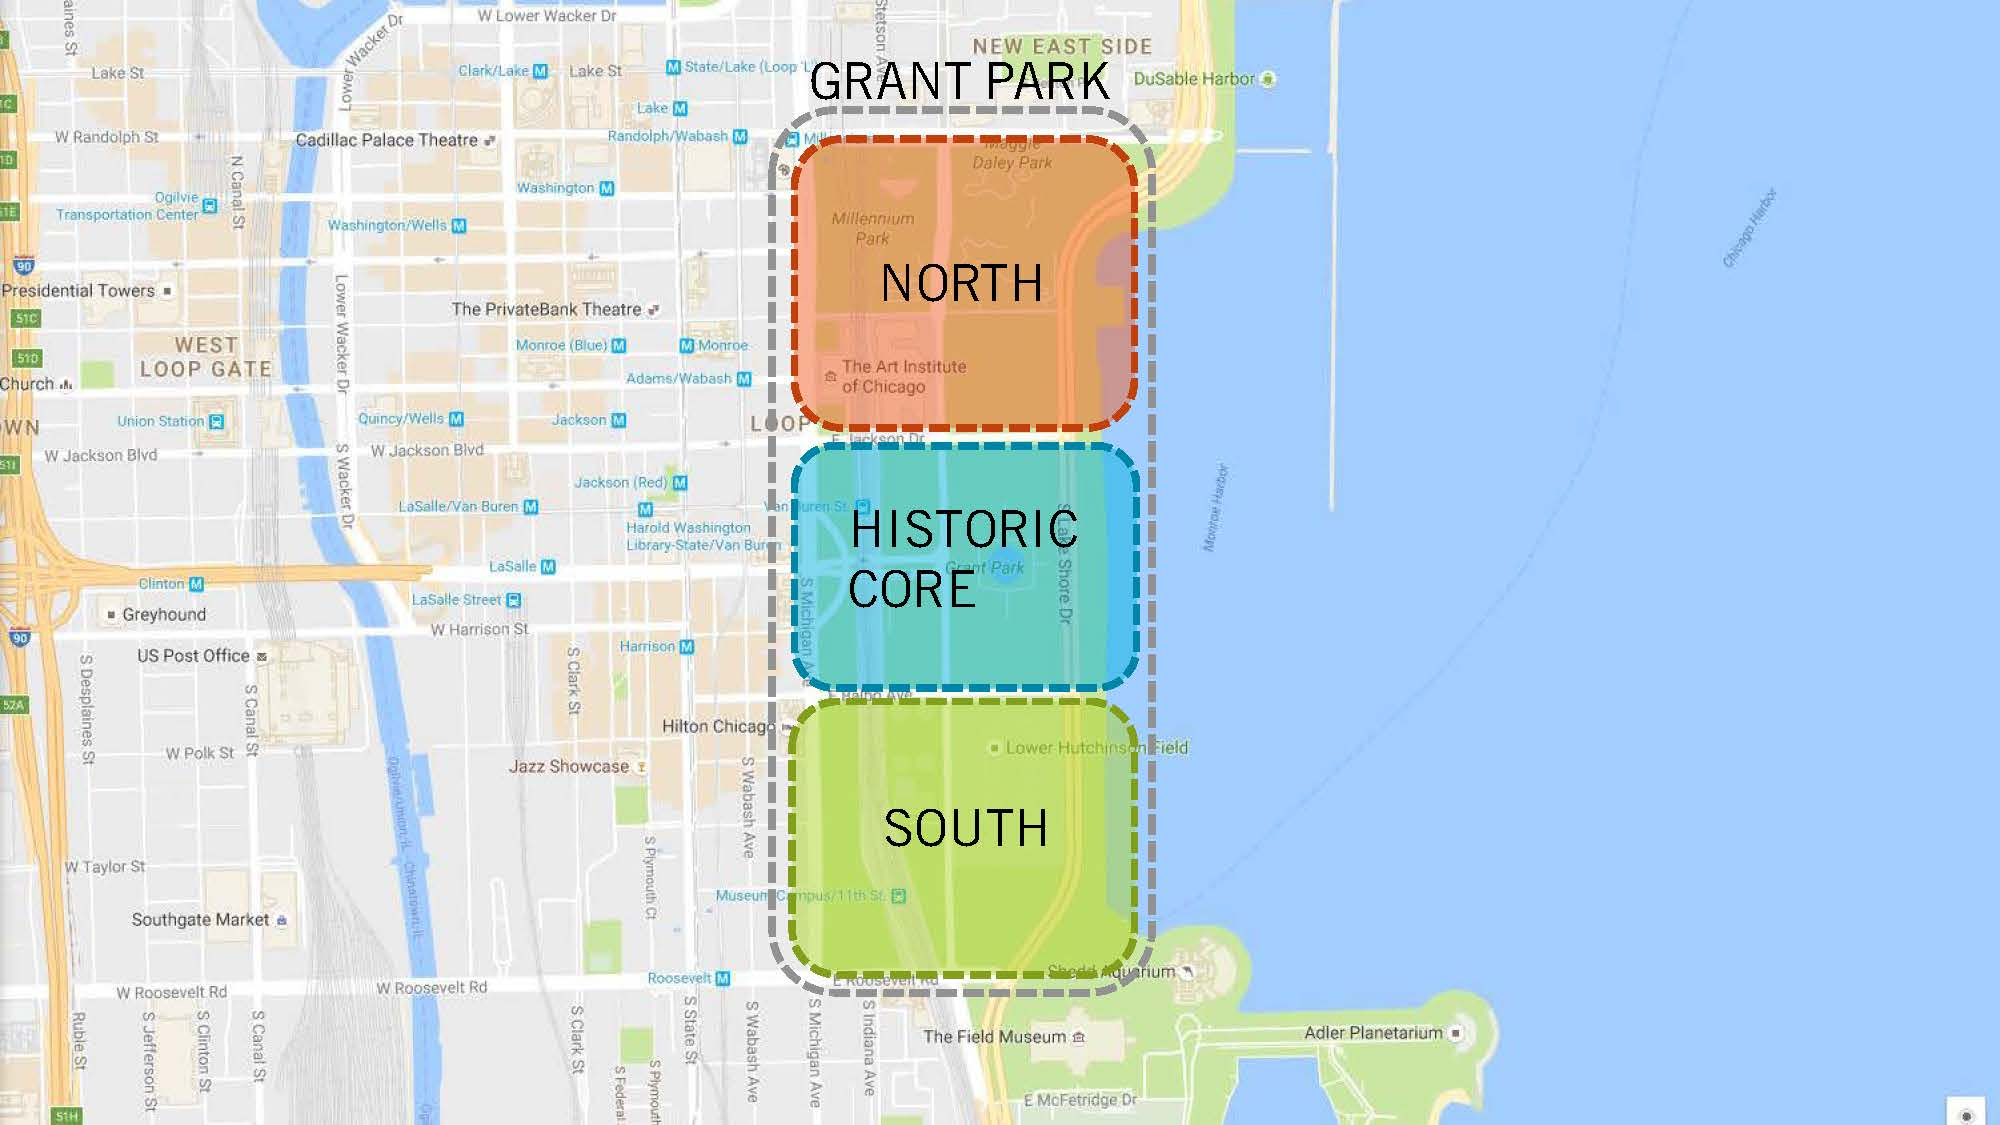 20160907 Grant Park Presentation_Page_22.jpg